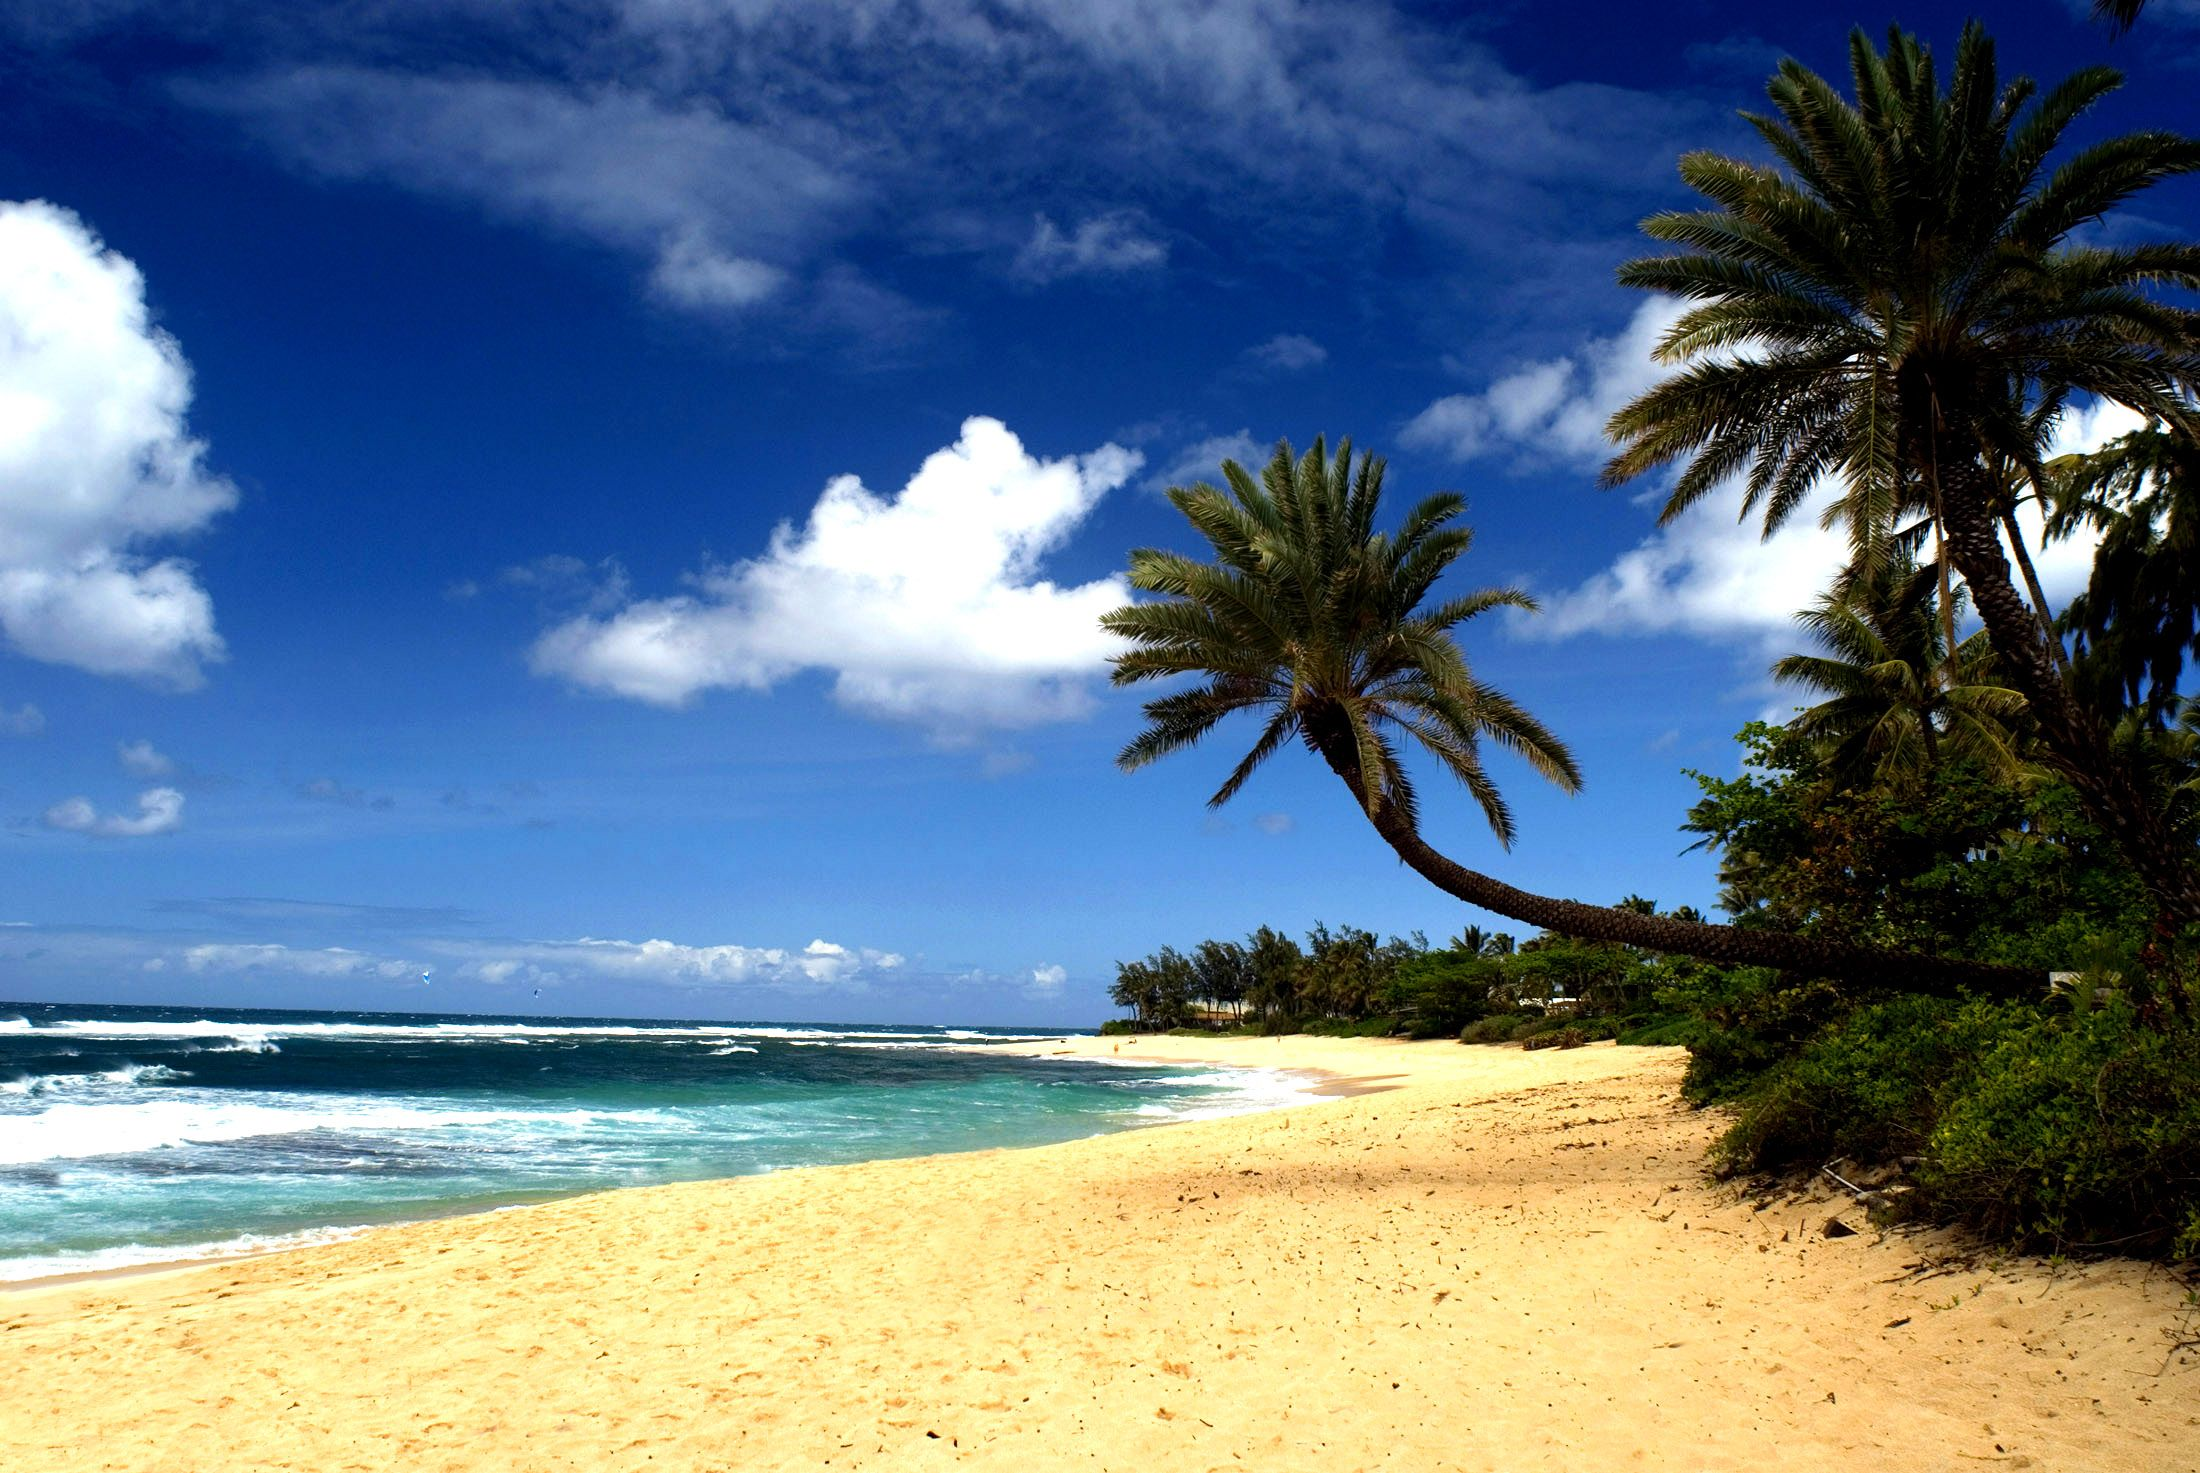 Oahu beach chair rental hawaii beach time - Hawaiian Beaches Hawaiian Beach Sand